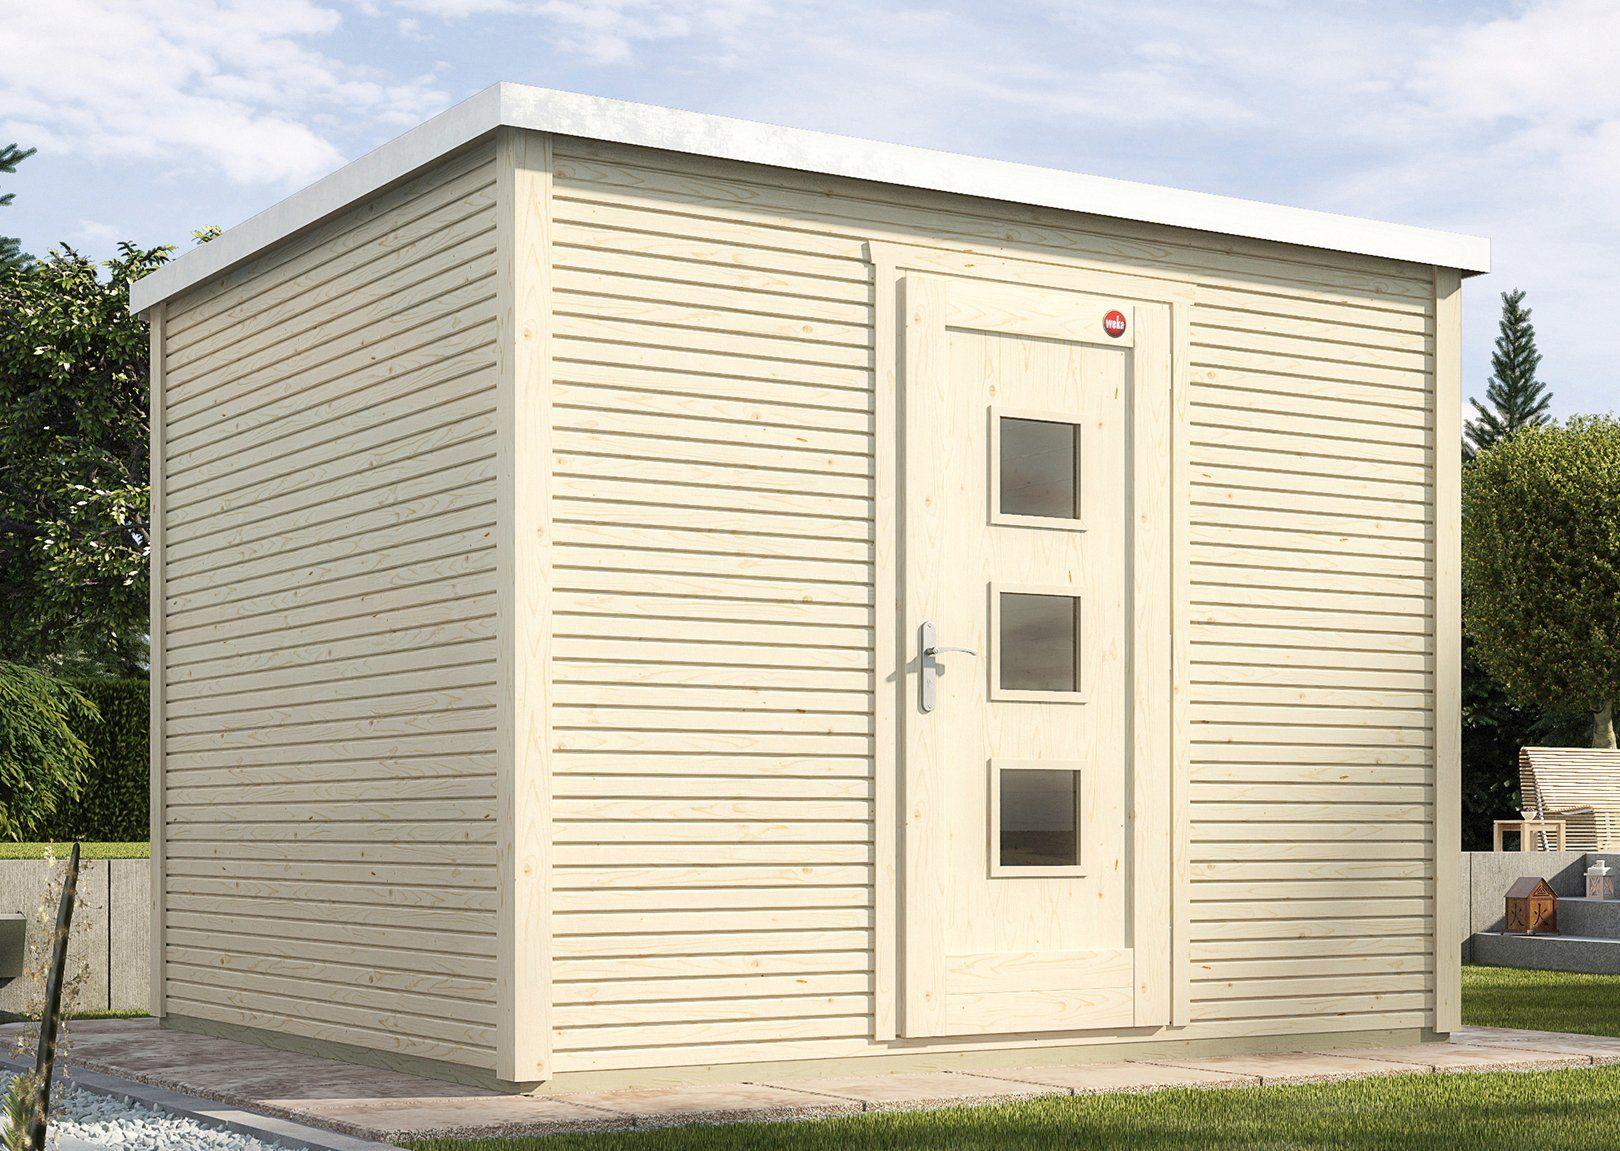 WEKA Gartenhaus »wekaLine 413 Gr.1«, BxT: 260x260 cm, inkl. Fußboden und Dachbahn